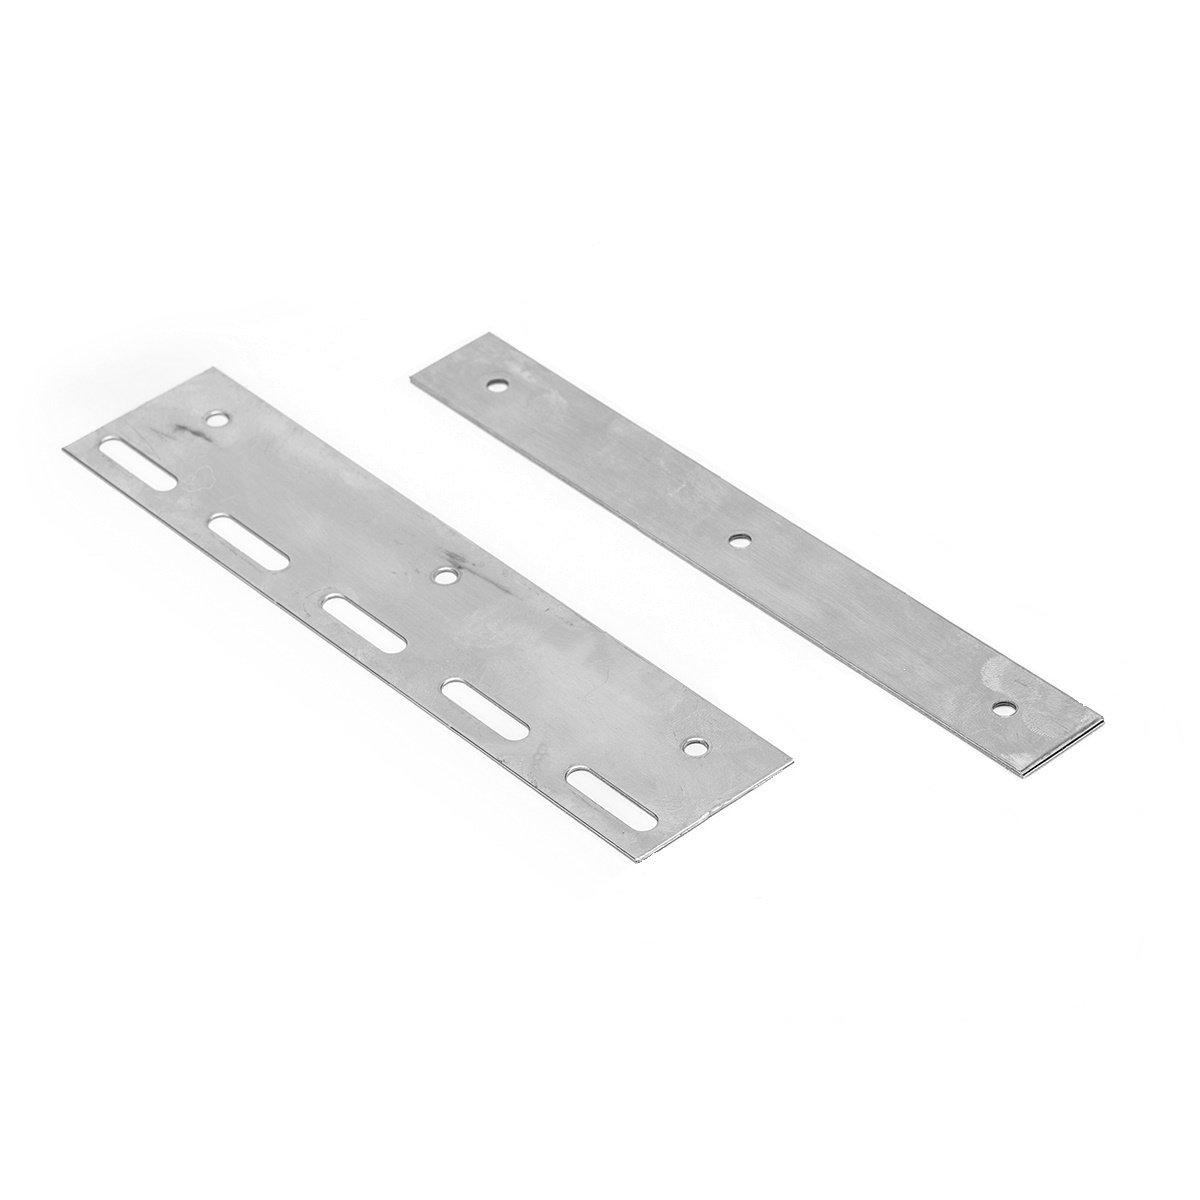 Befestigungsplatte f/ür Lamellen Lamellenvorhang PVC-Streifenvorhang L/änge 20cm